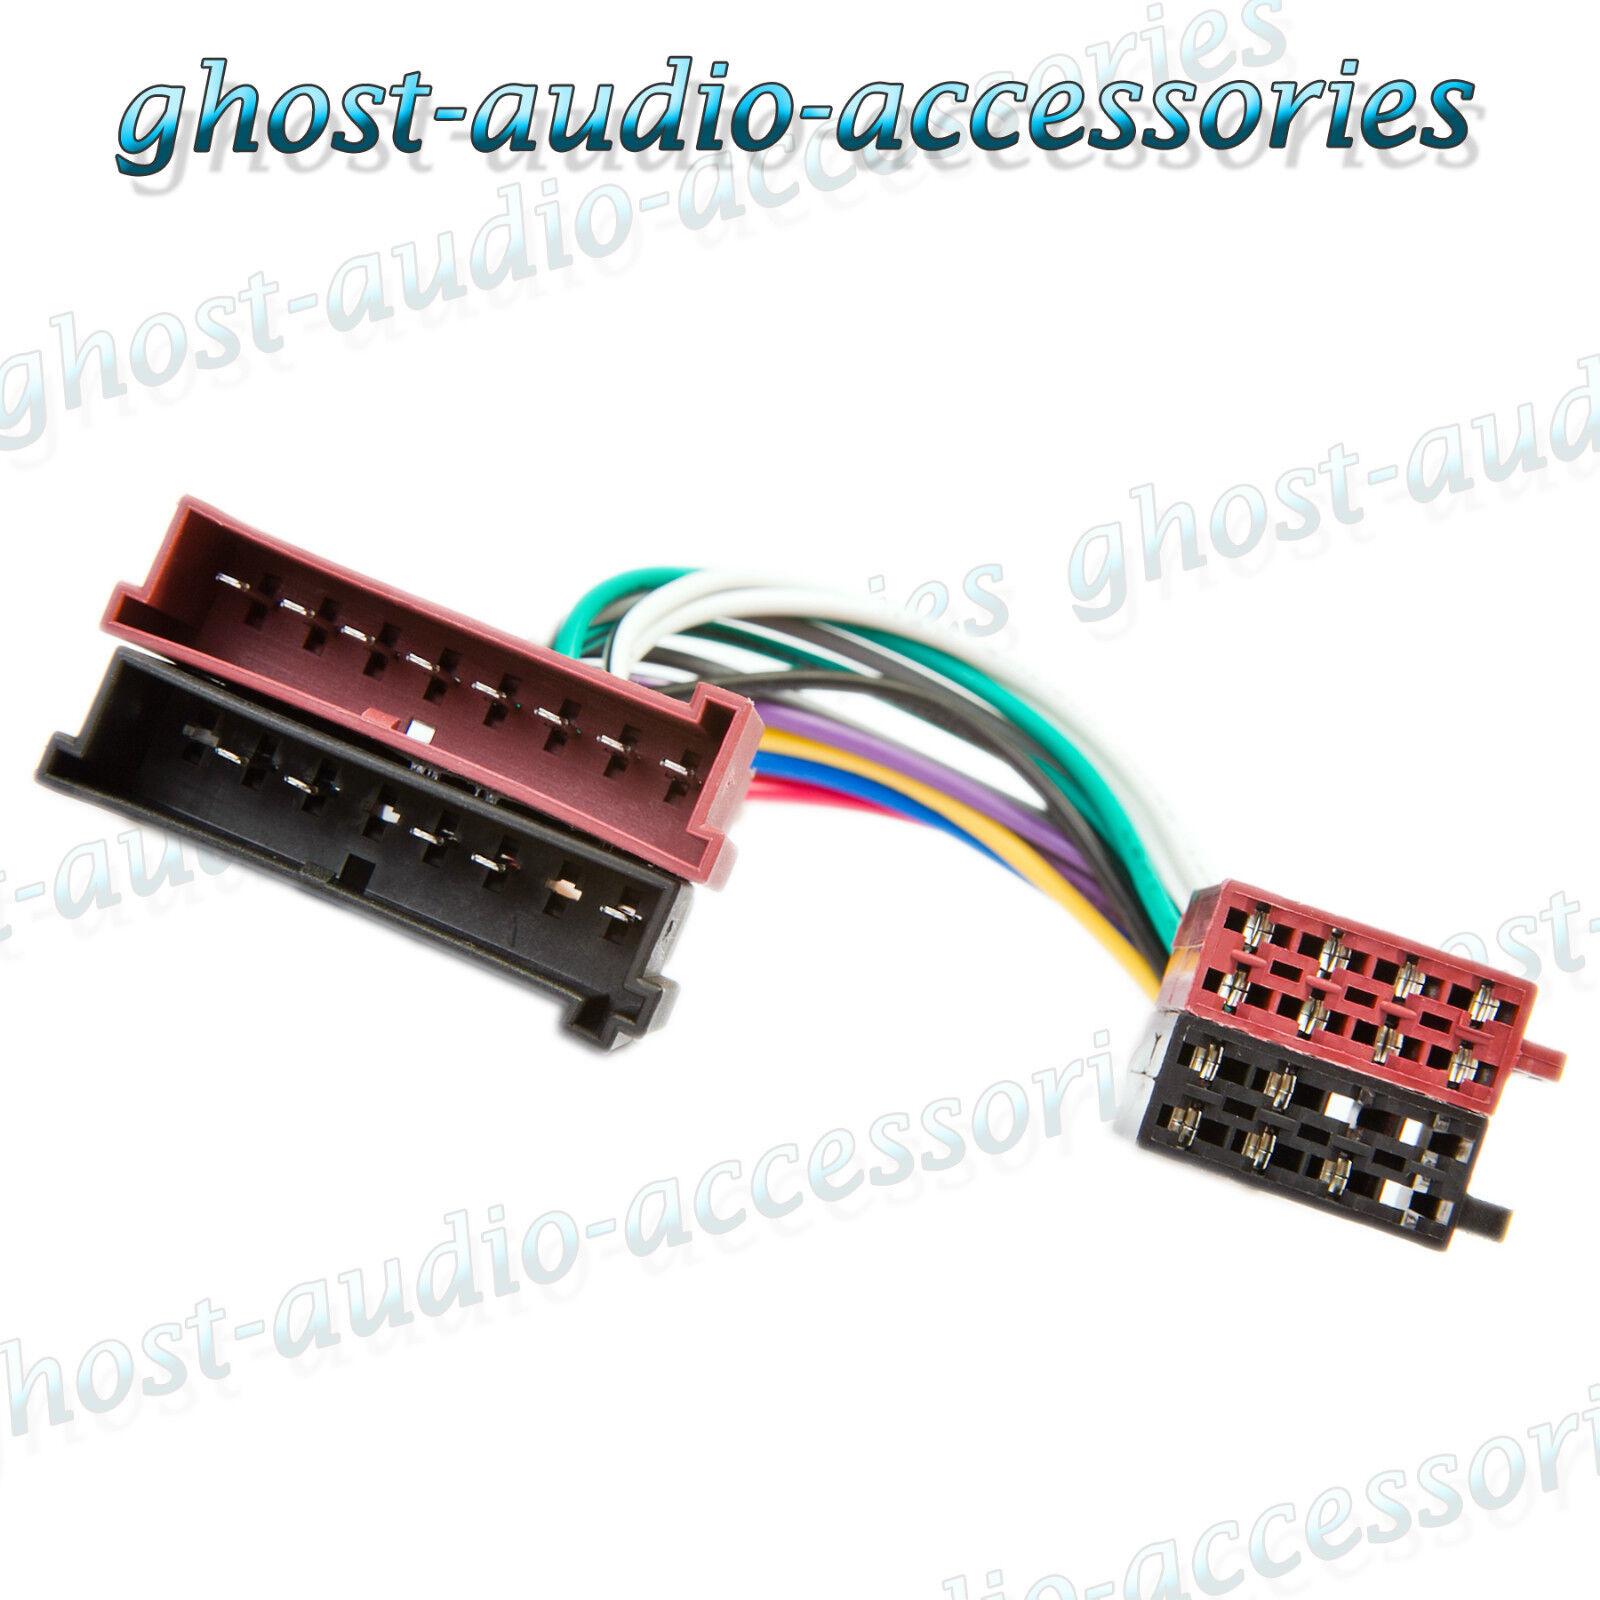 ford mondeo radio wiring diagram 2004 silverado bose stereo iso car harness adapter